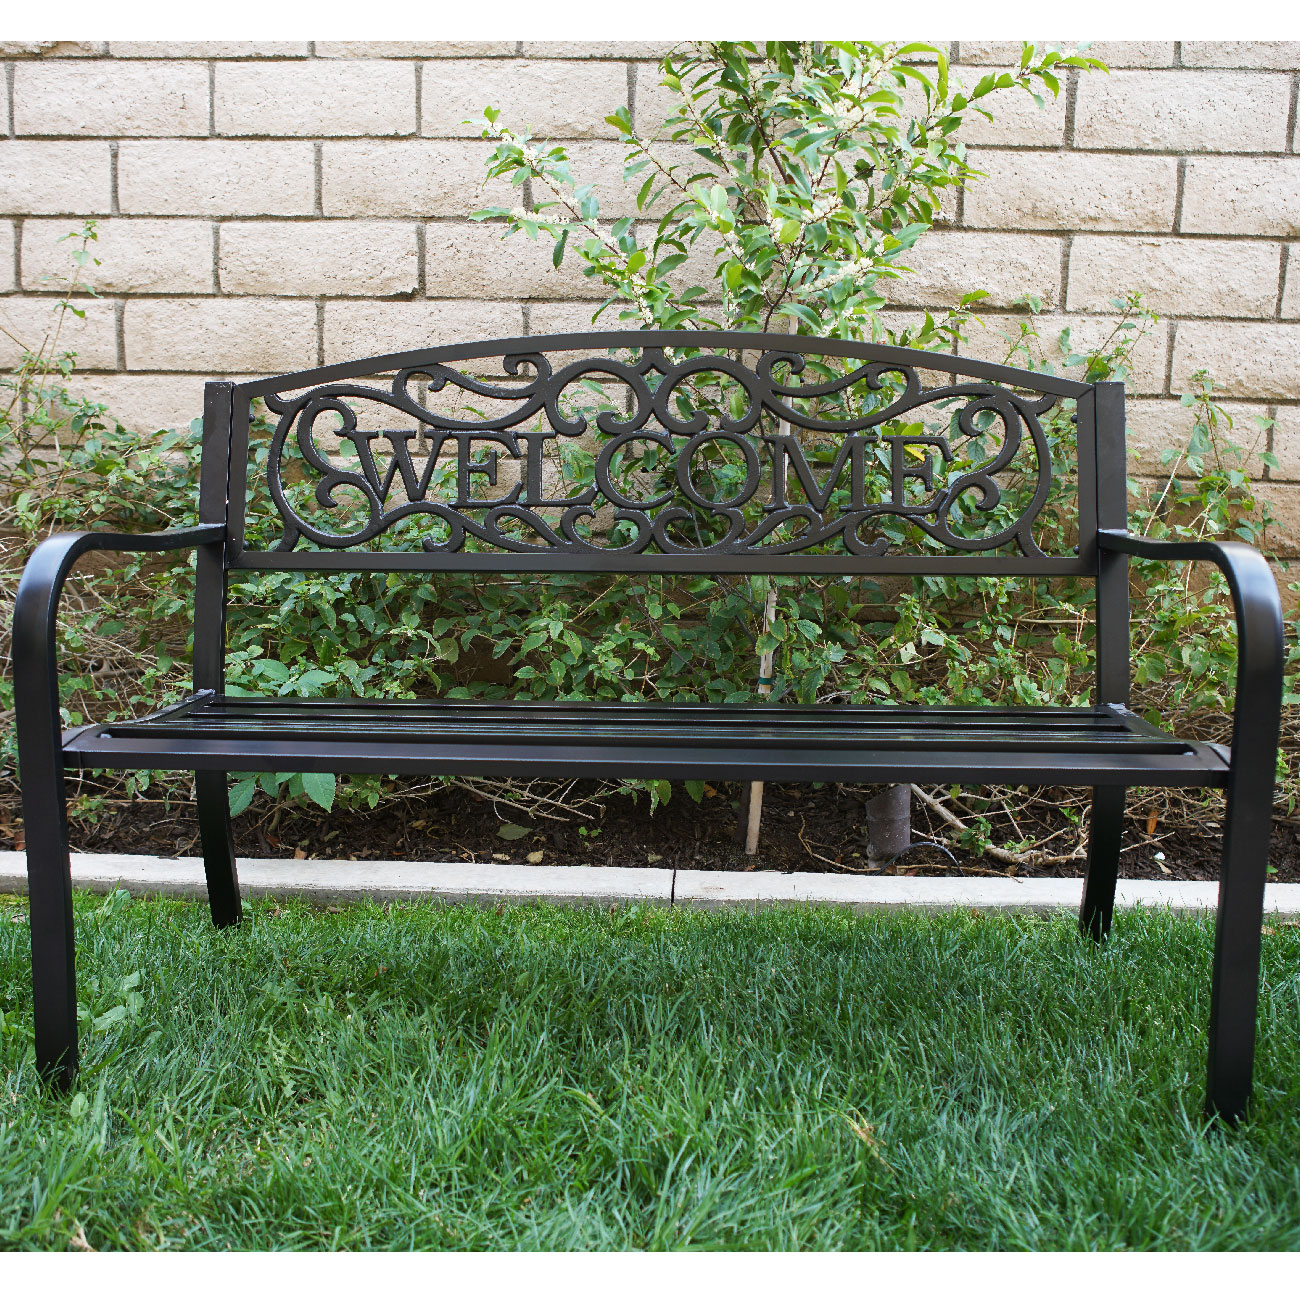 Outdoor Bench Patio Garden Furniture Deck Metal Porch Seat Chair Park Backyard Ebay